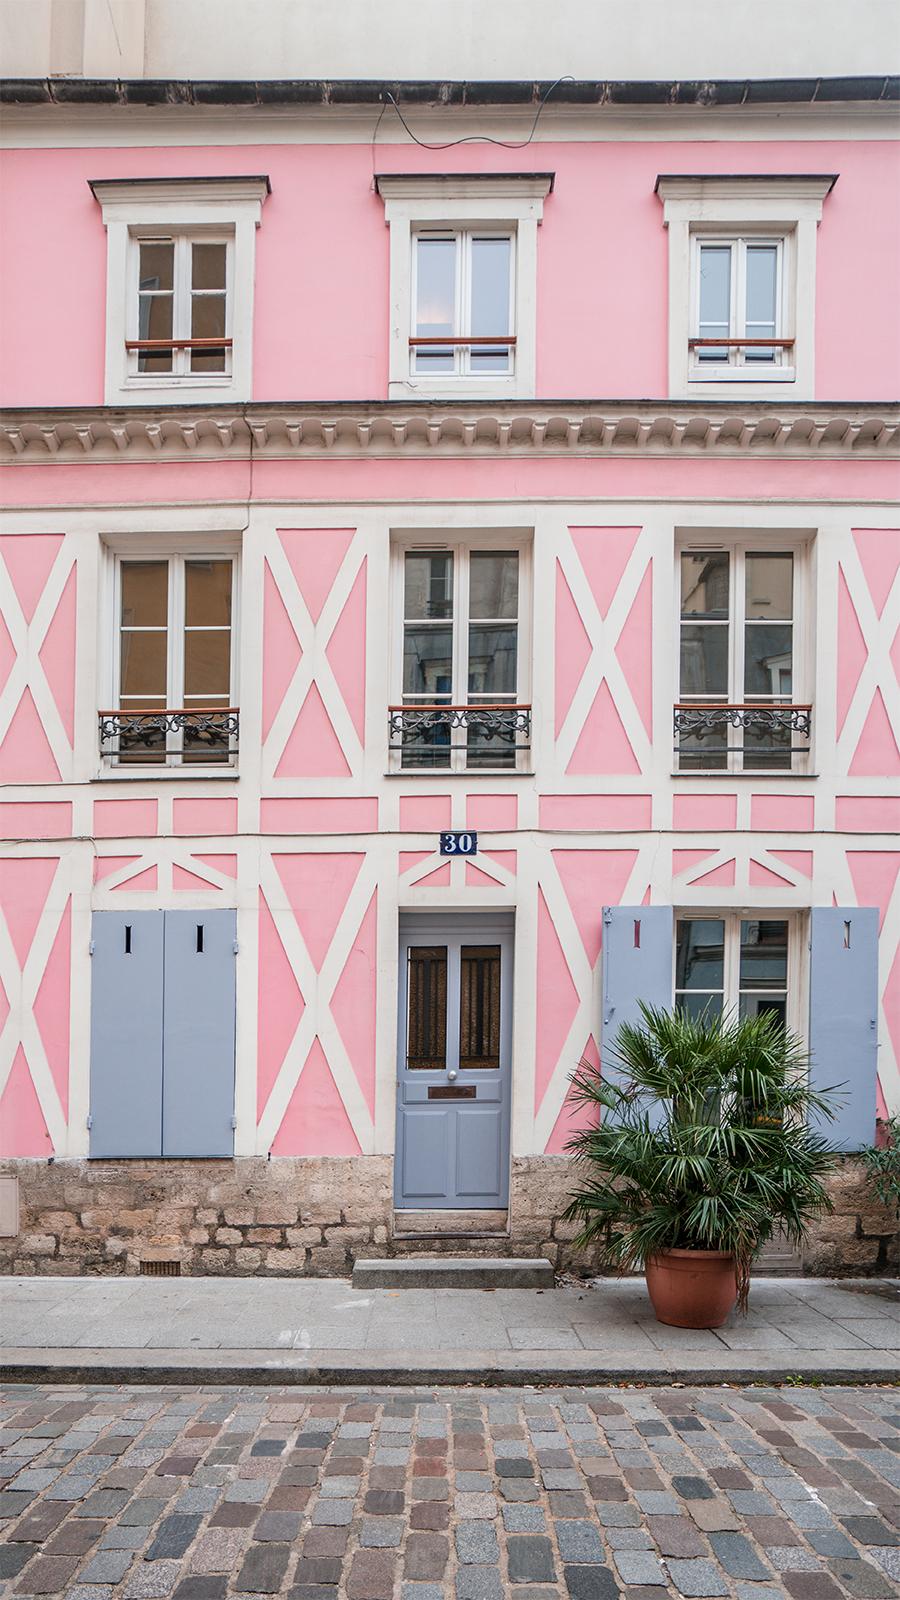 Hotels We Love: Courtyard Marriott Gare De Lyon